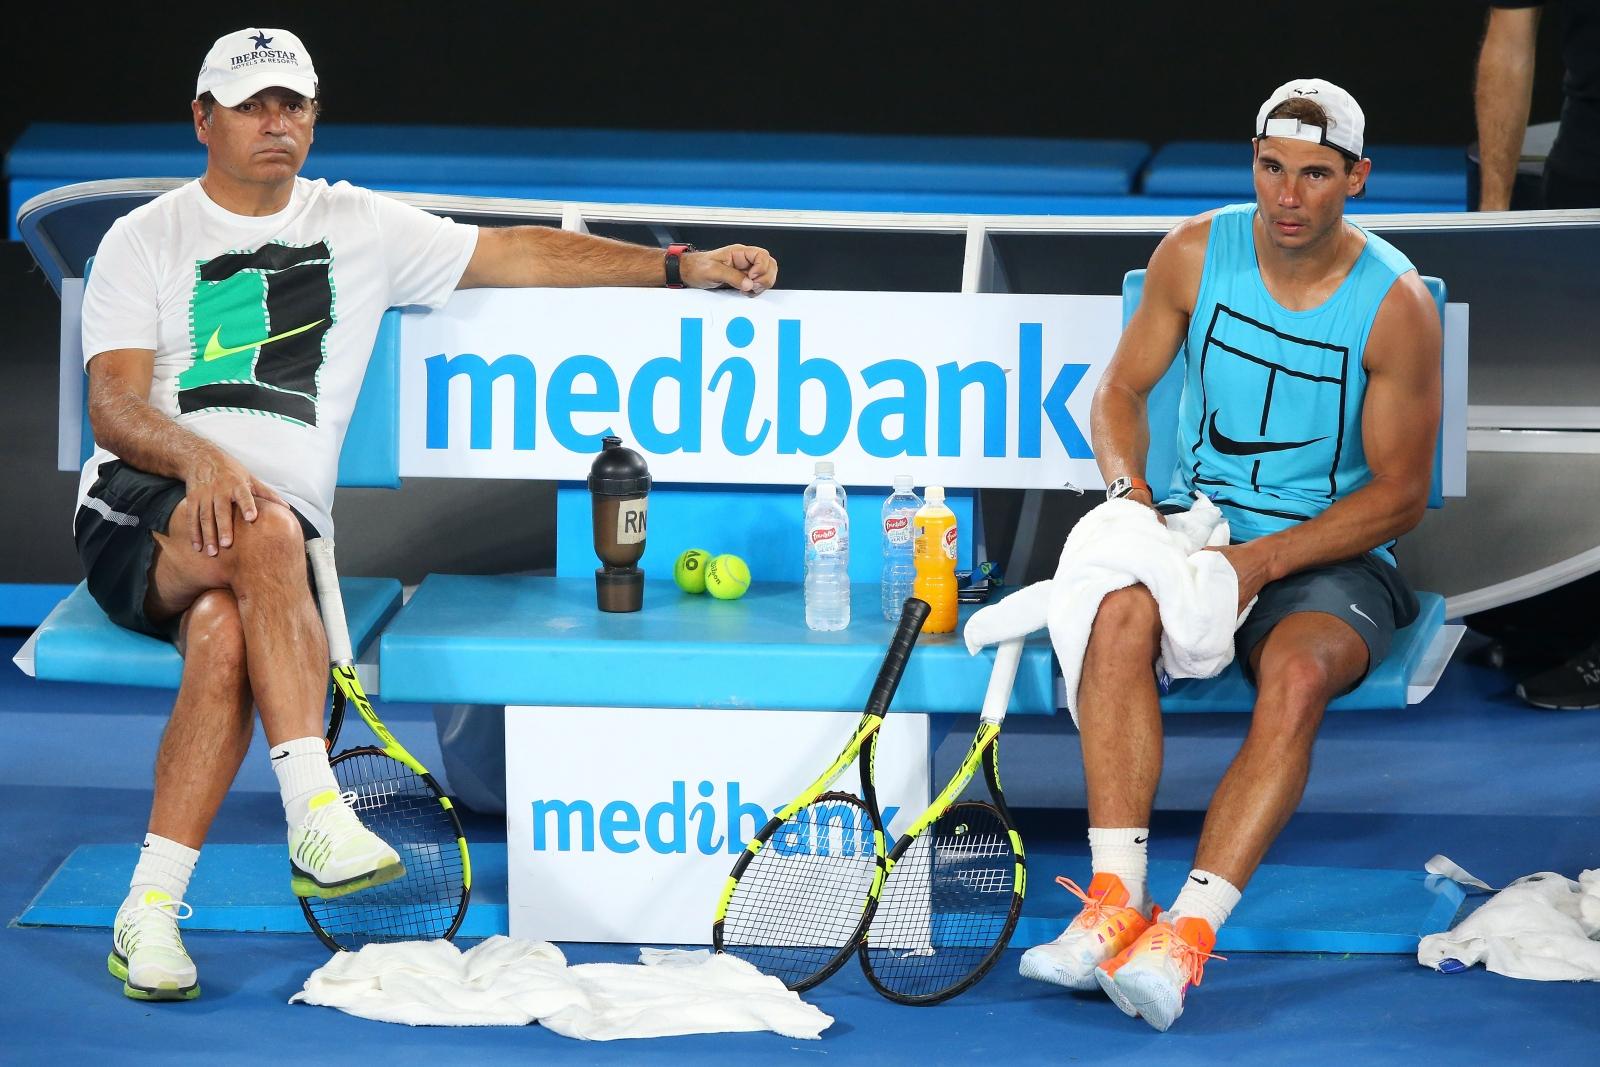 Rafael and Toni Nadal